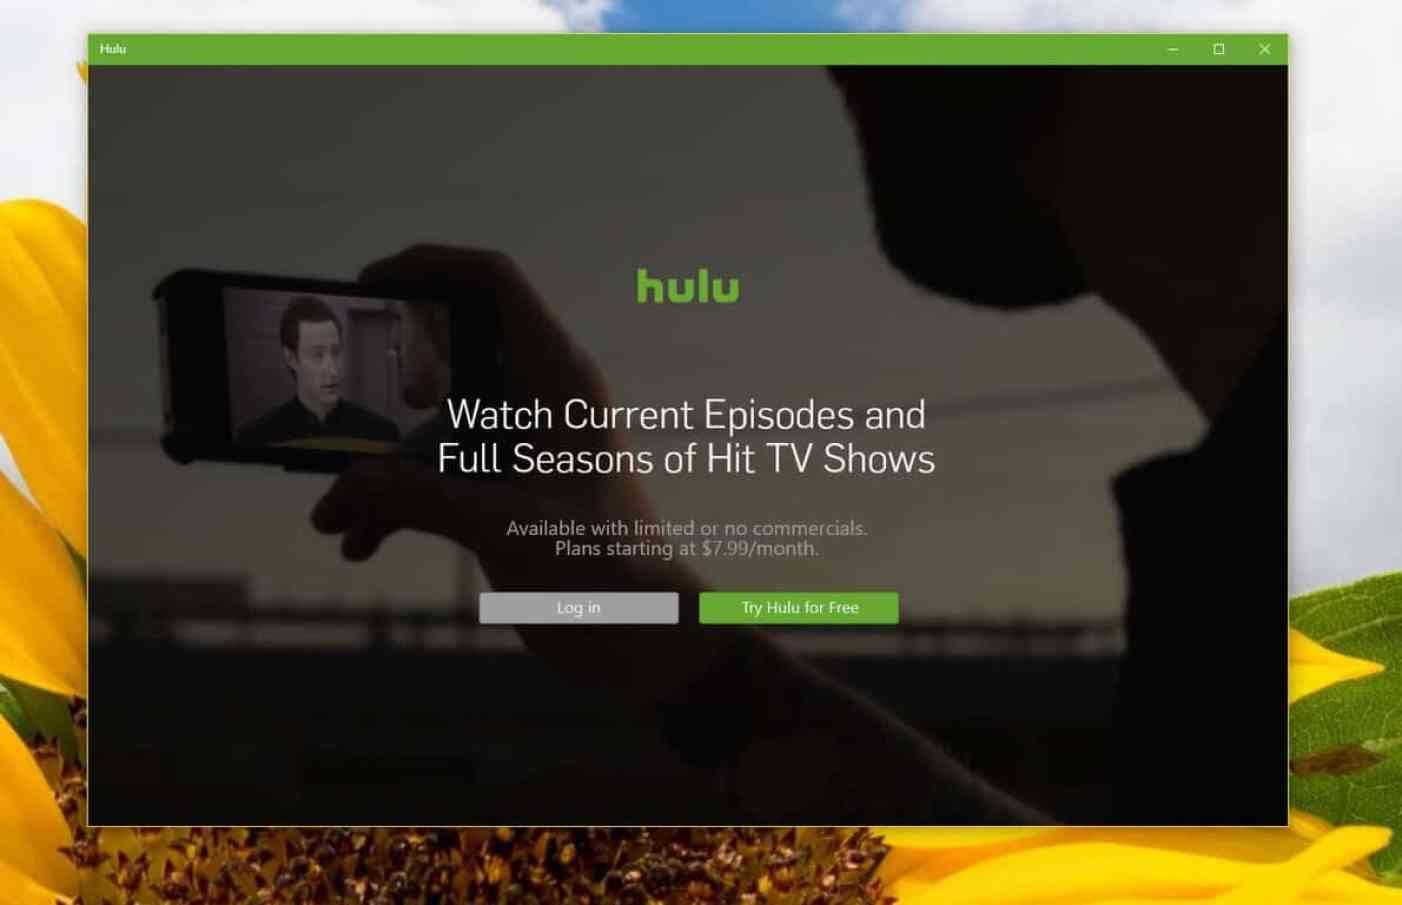 Windows 10 Hulu app